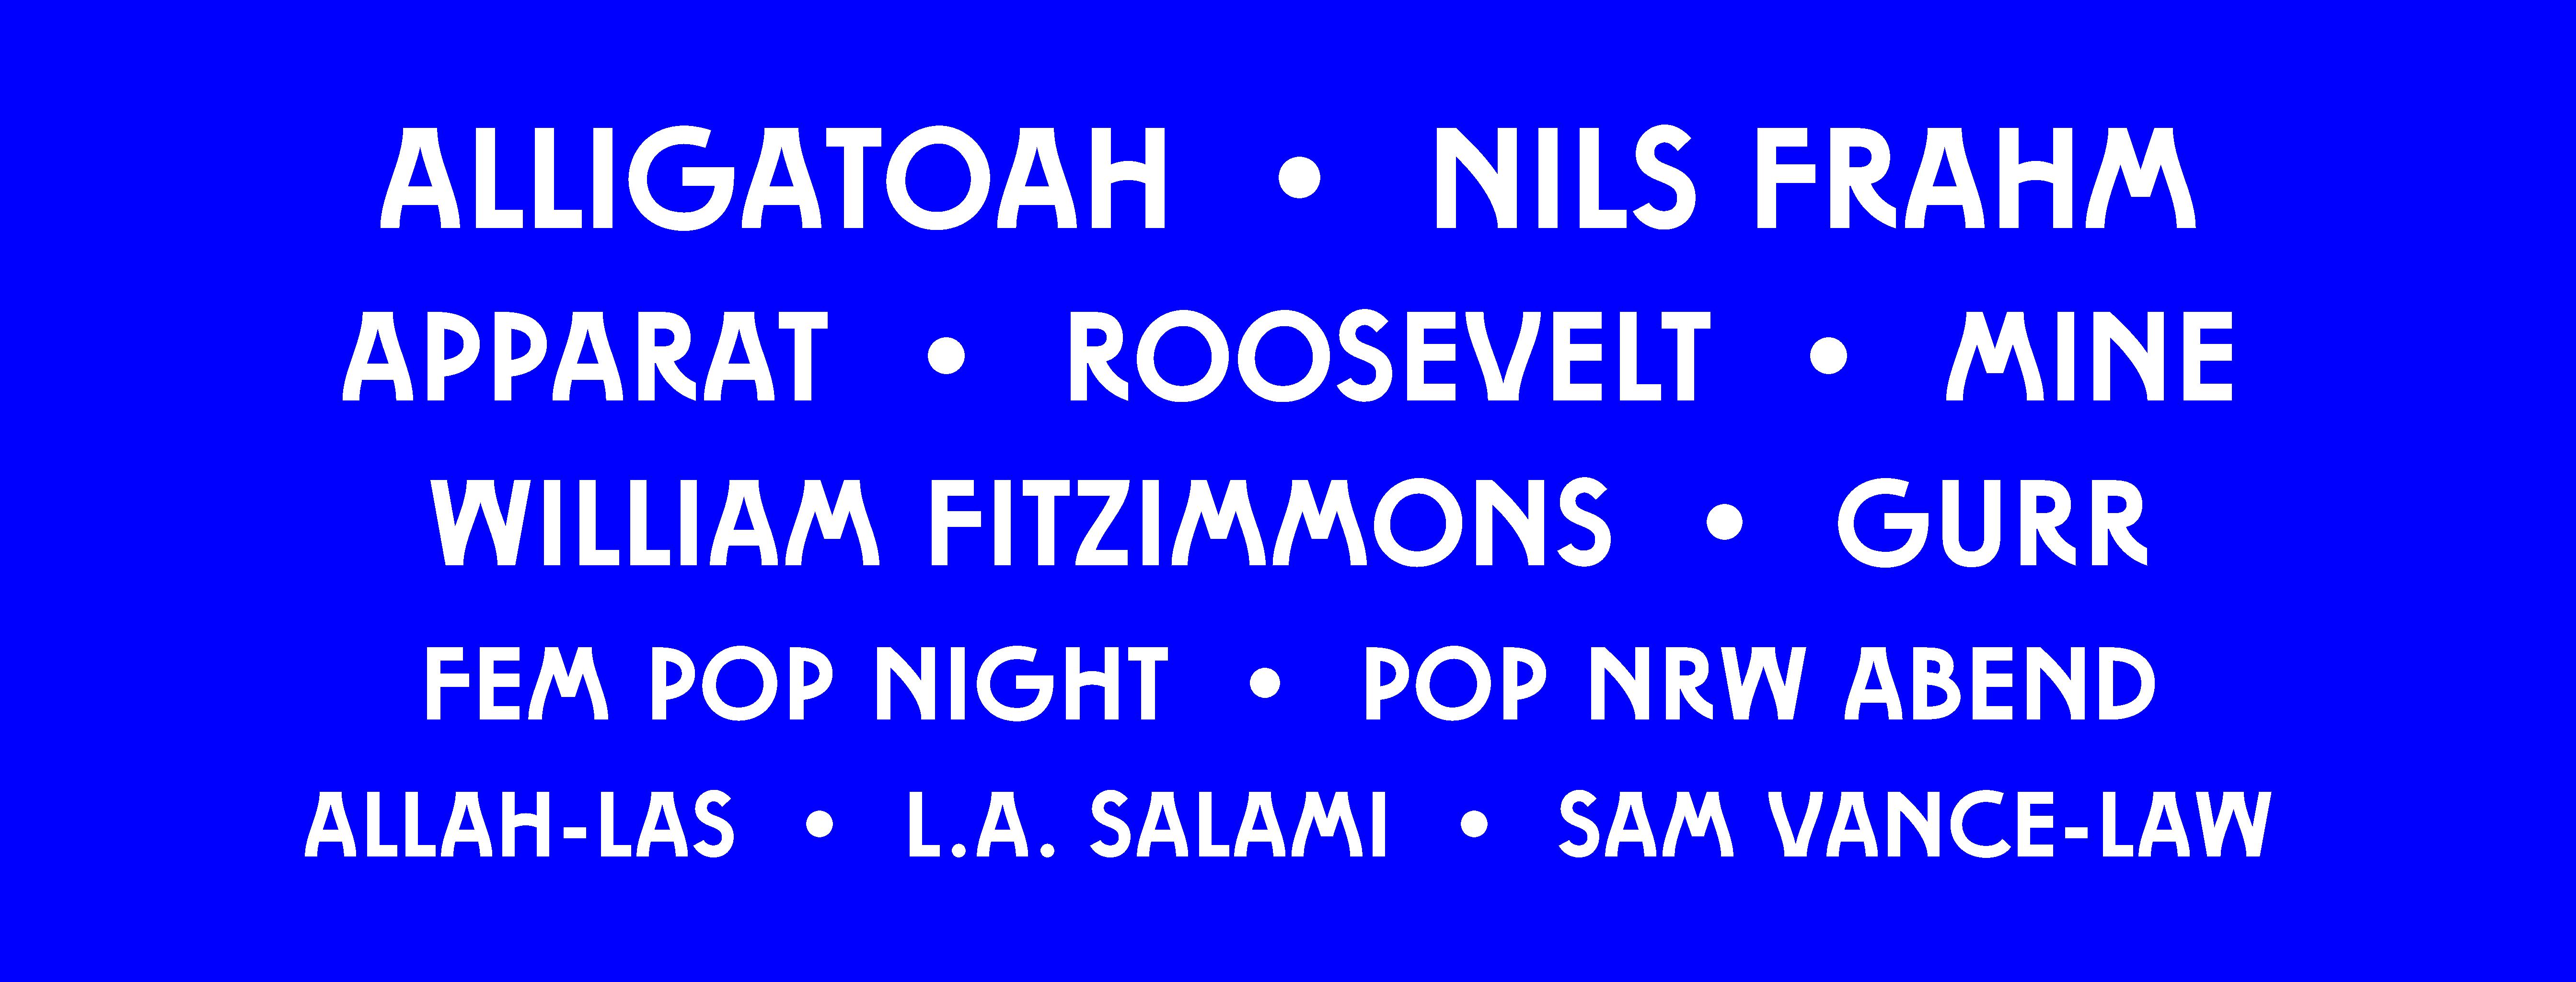 New Fall Festival gibt finales Line-Up für 2019 bekannt